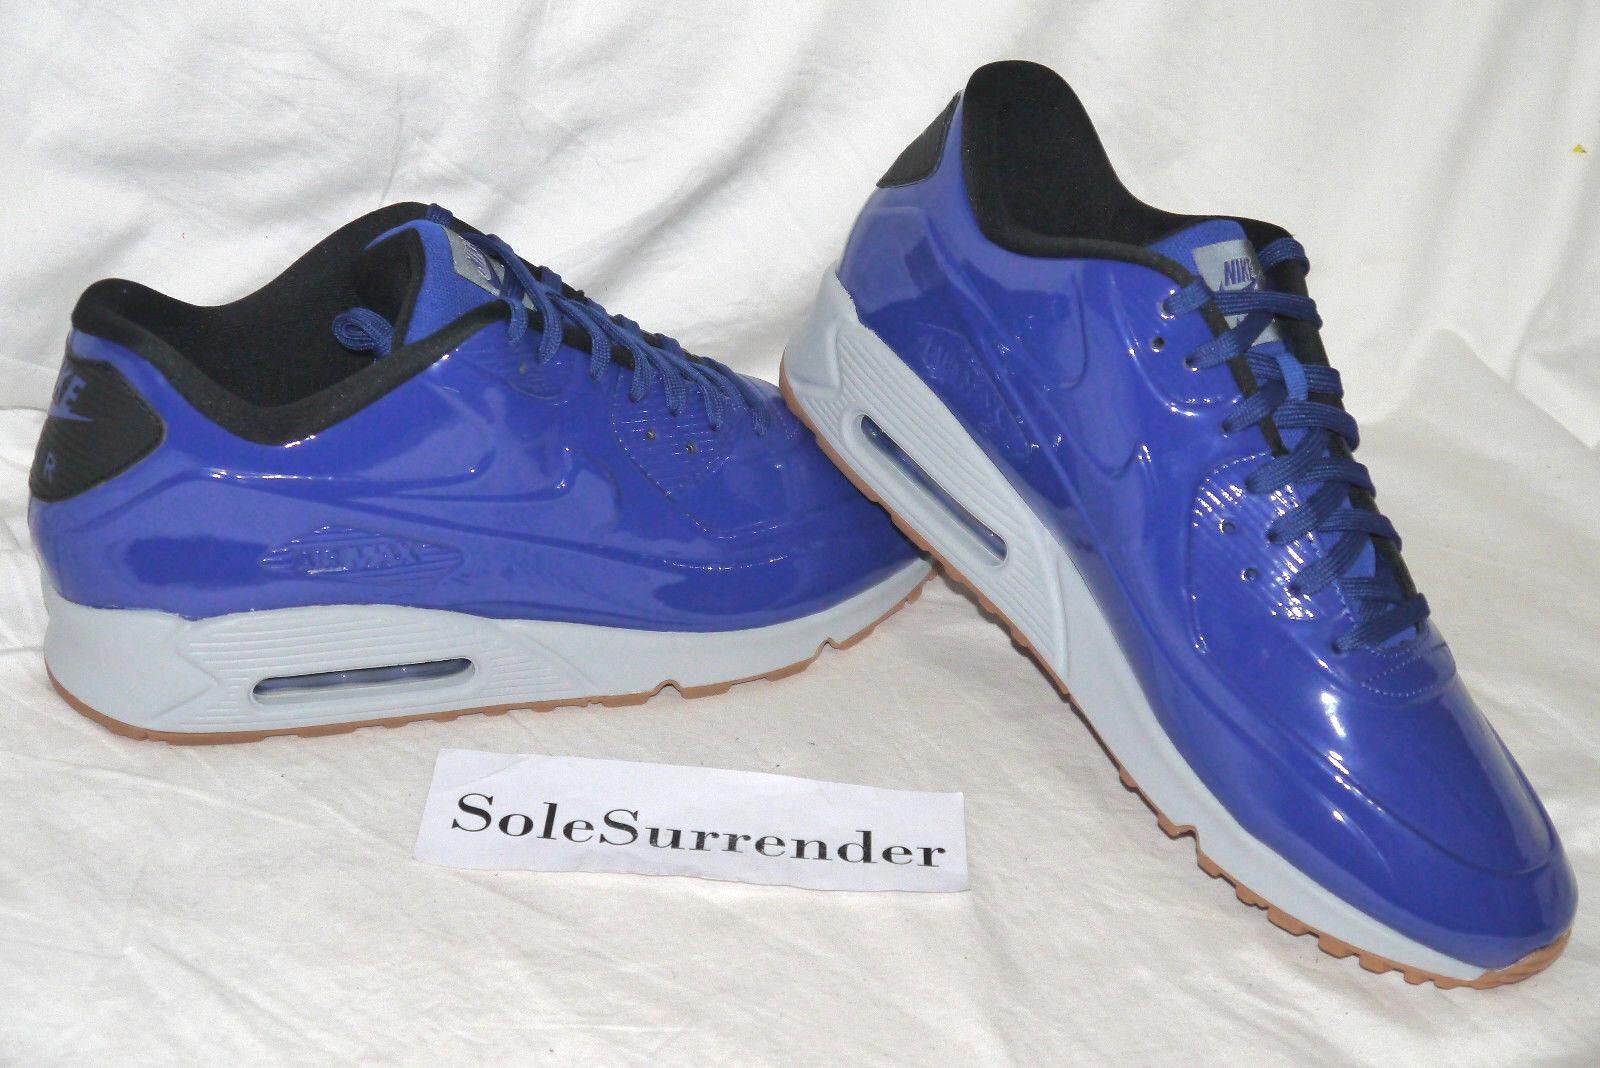 Nike Air Max 90 Vt Qs Sneakers, £128 |